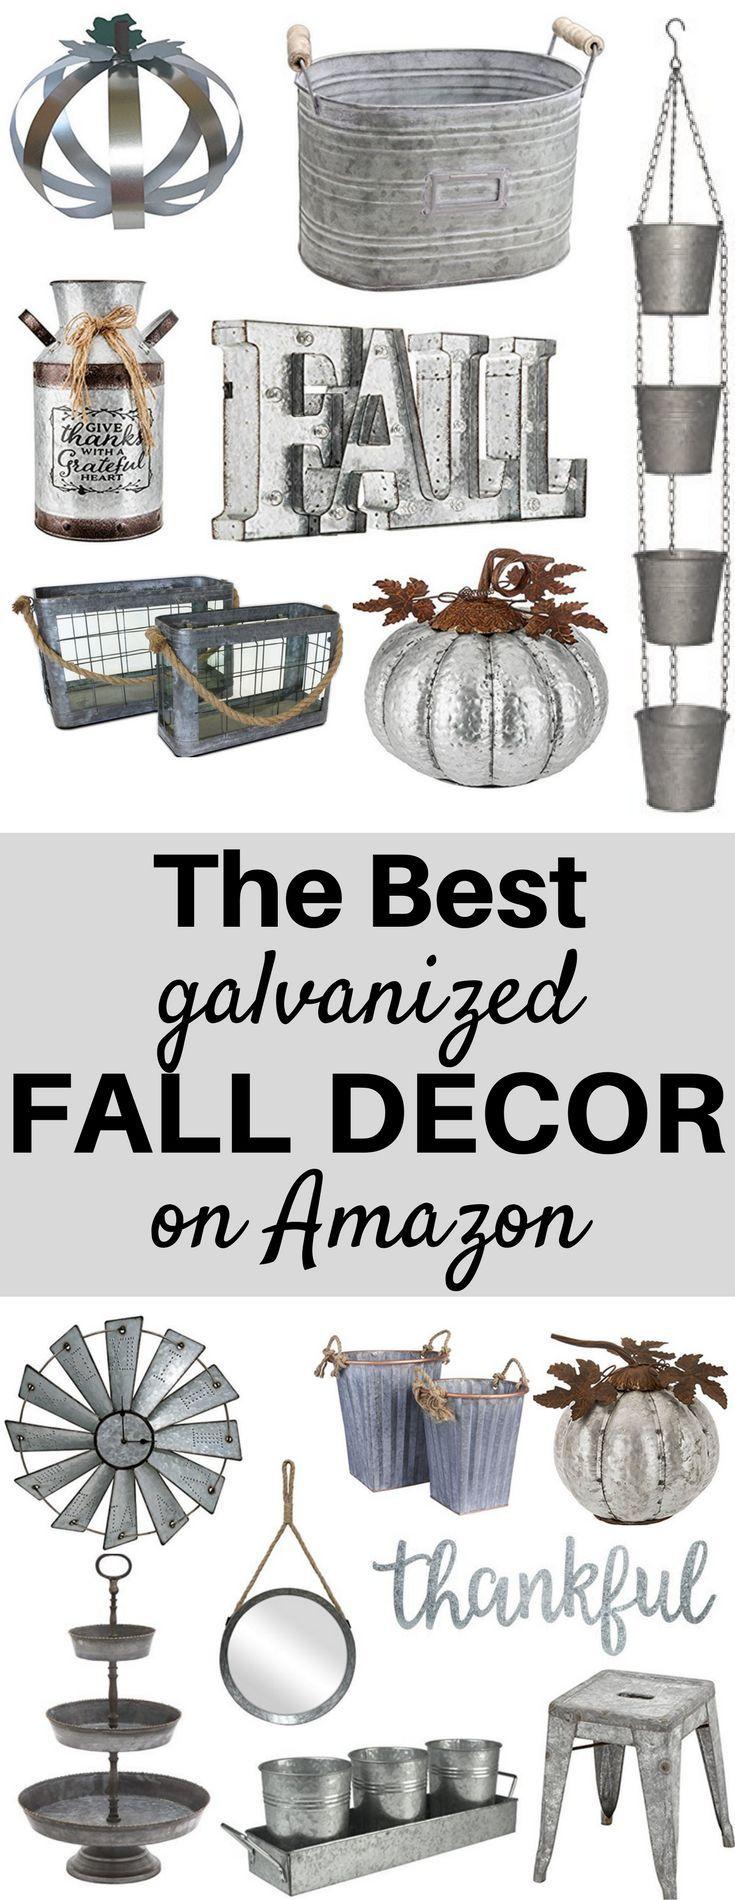 A Brick Home: galvanized fall decor, galvanized fall decorations, galvanized fall bucket, farmhouse style galvanized fall decor, barn tin, fall decor, fall decor ideas for the home